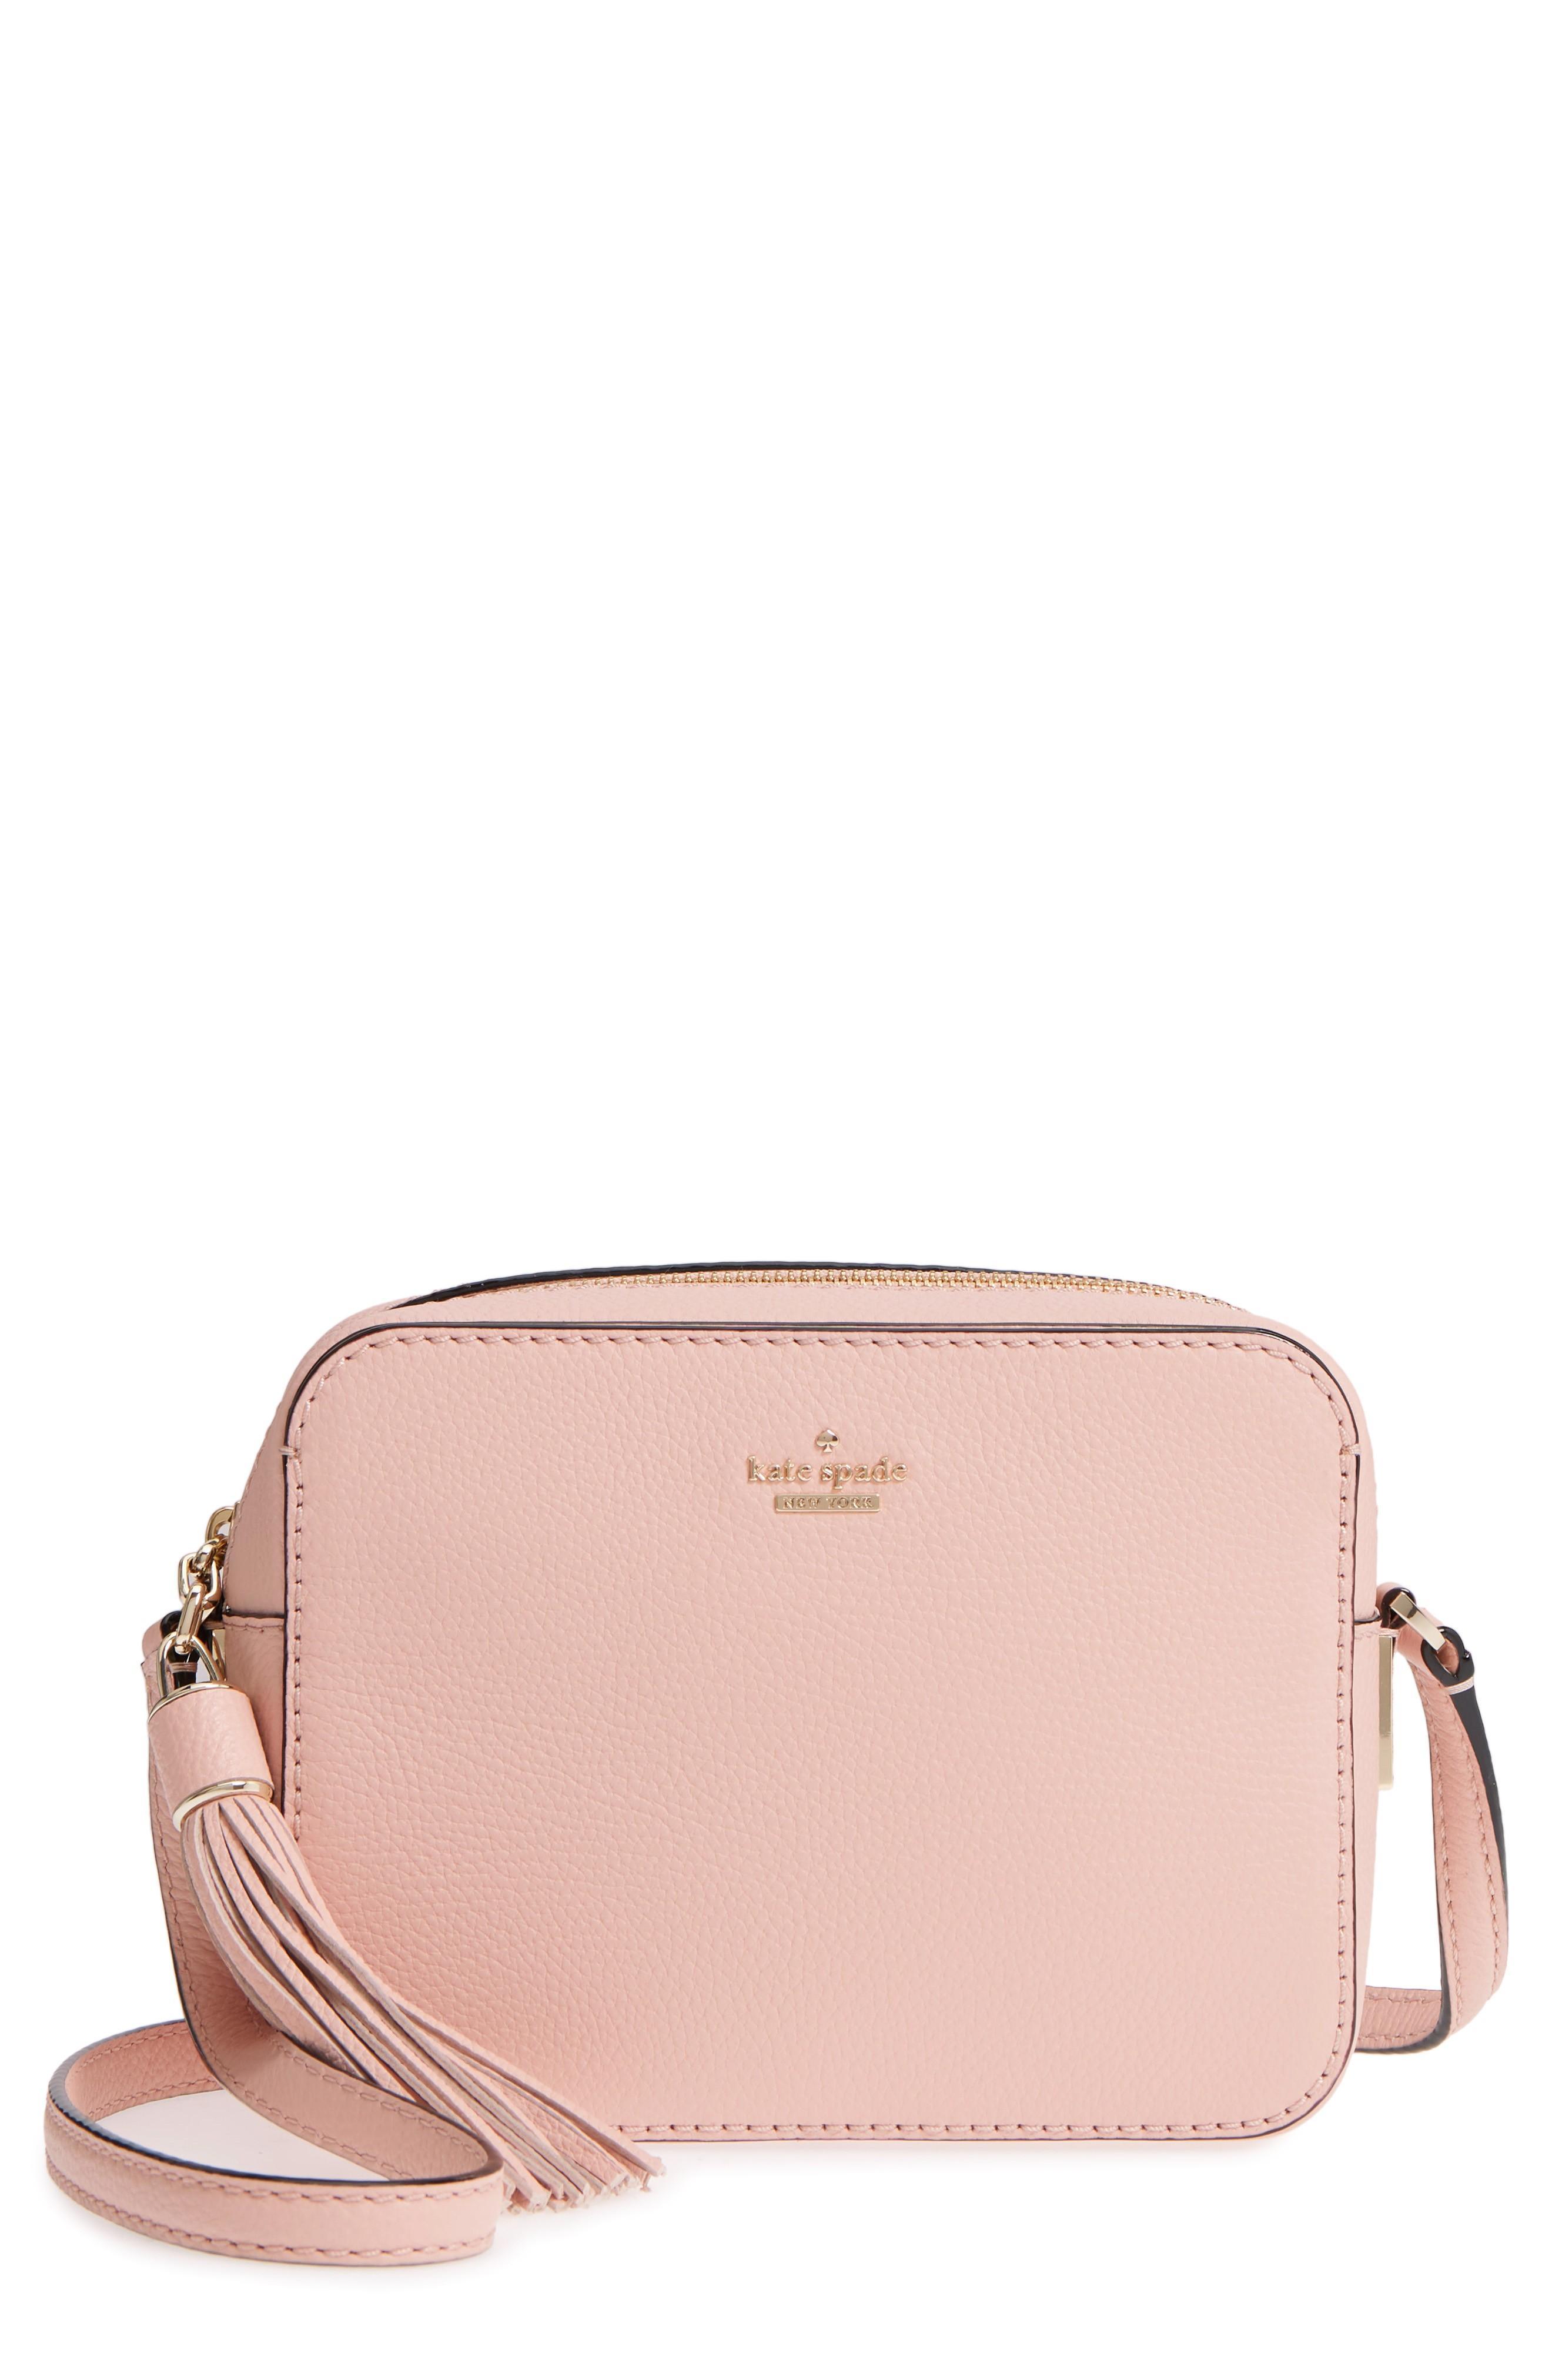 512c66cbab63 Style Name  Kate Spade New York Kingston Drive - Arla Leather Crossbody Bag.